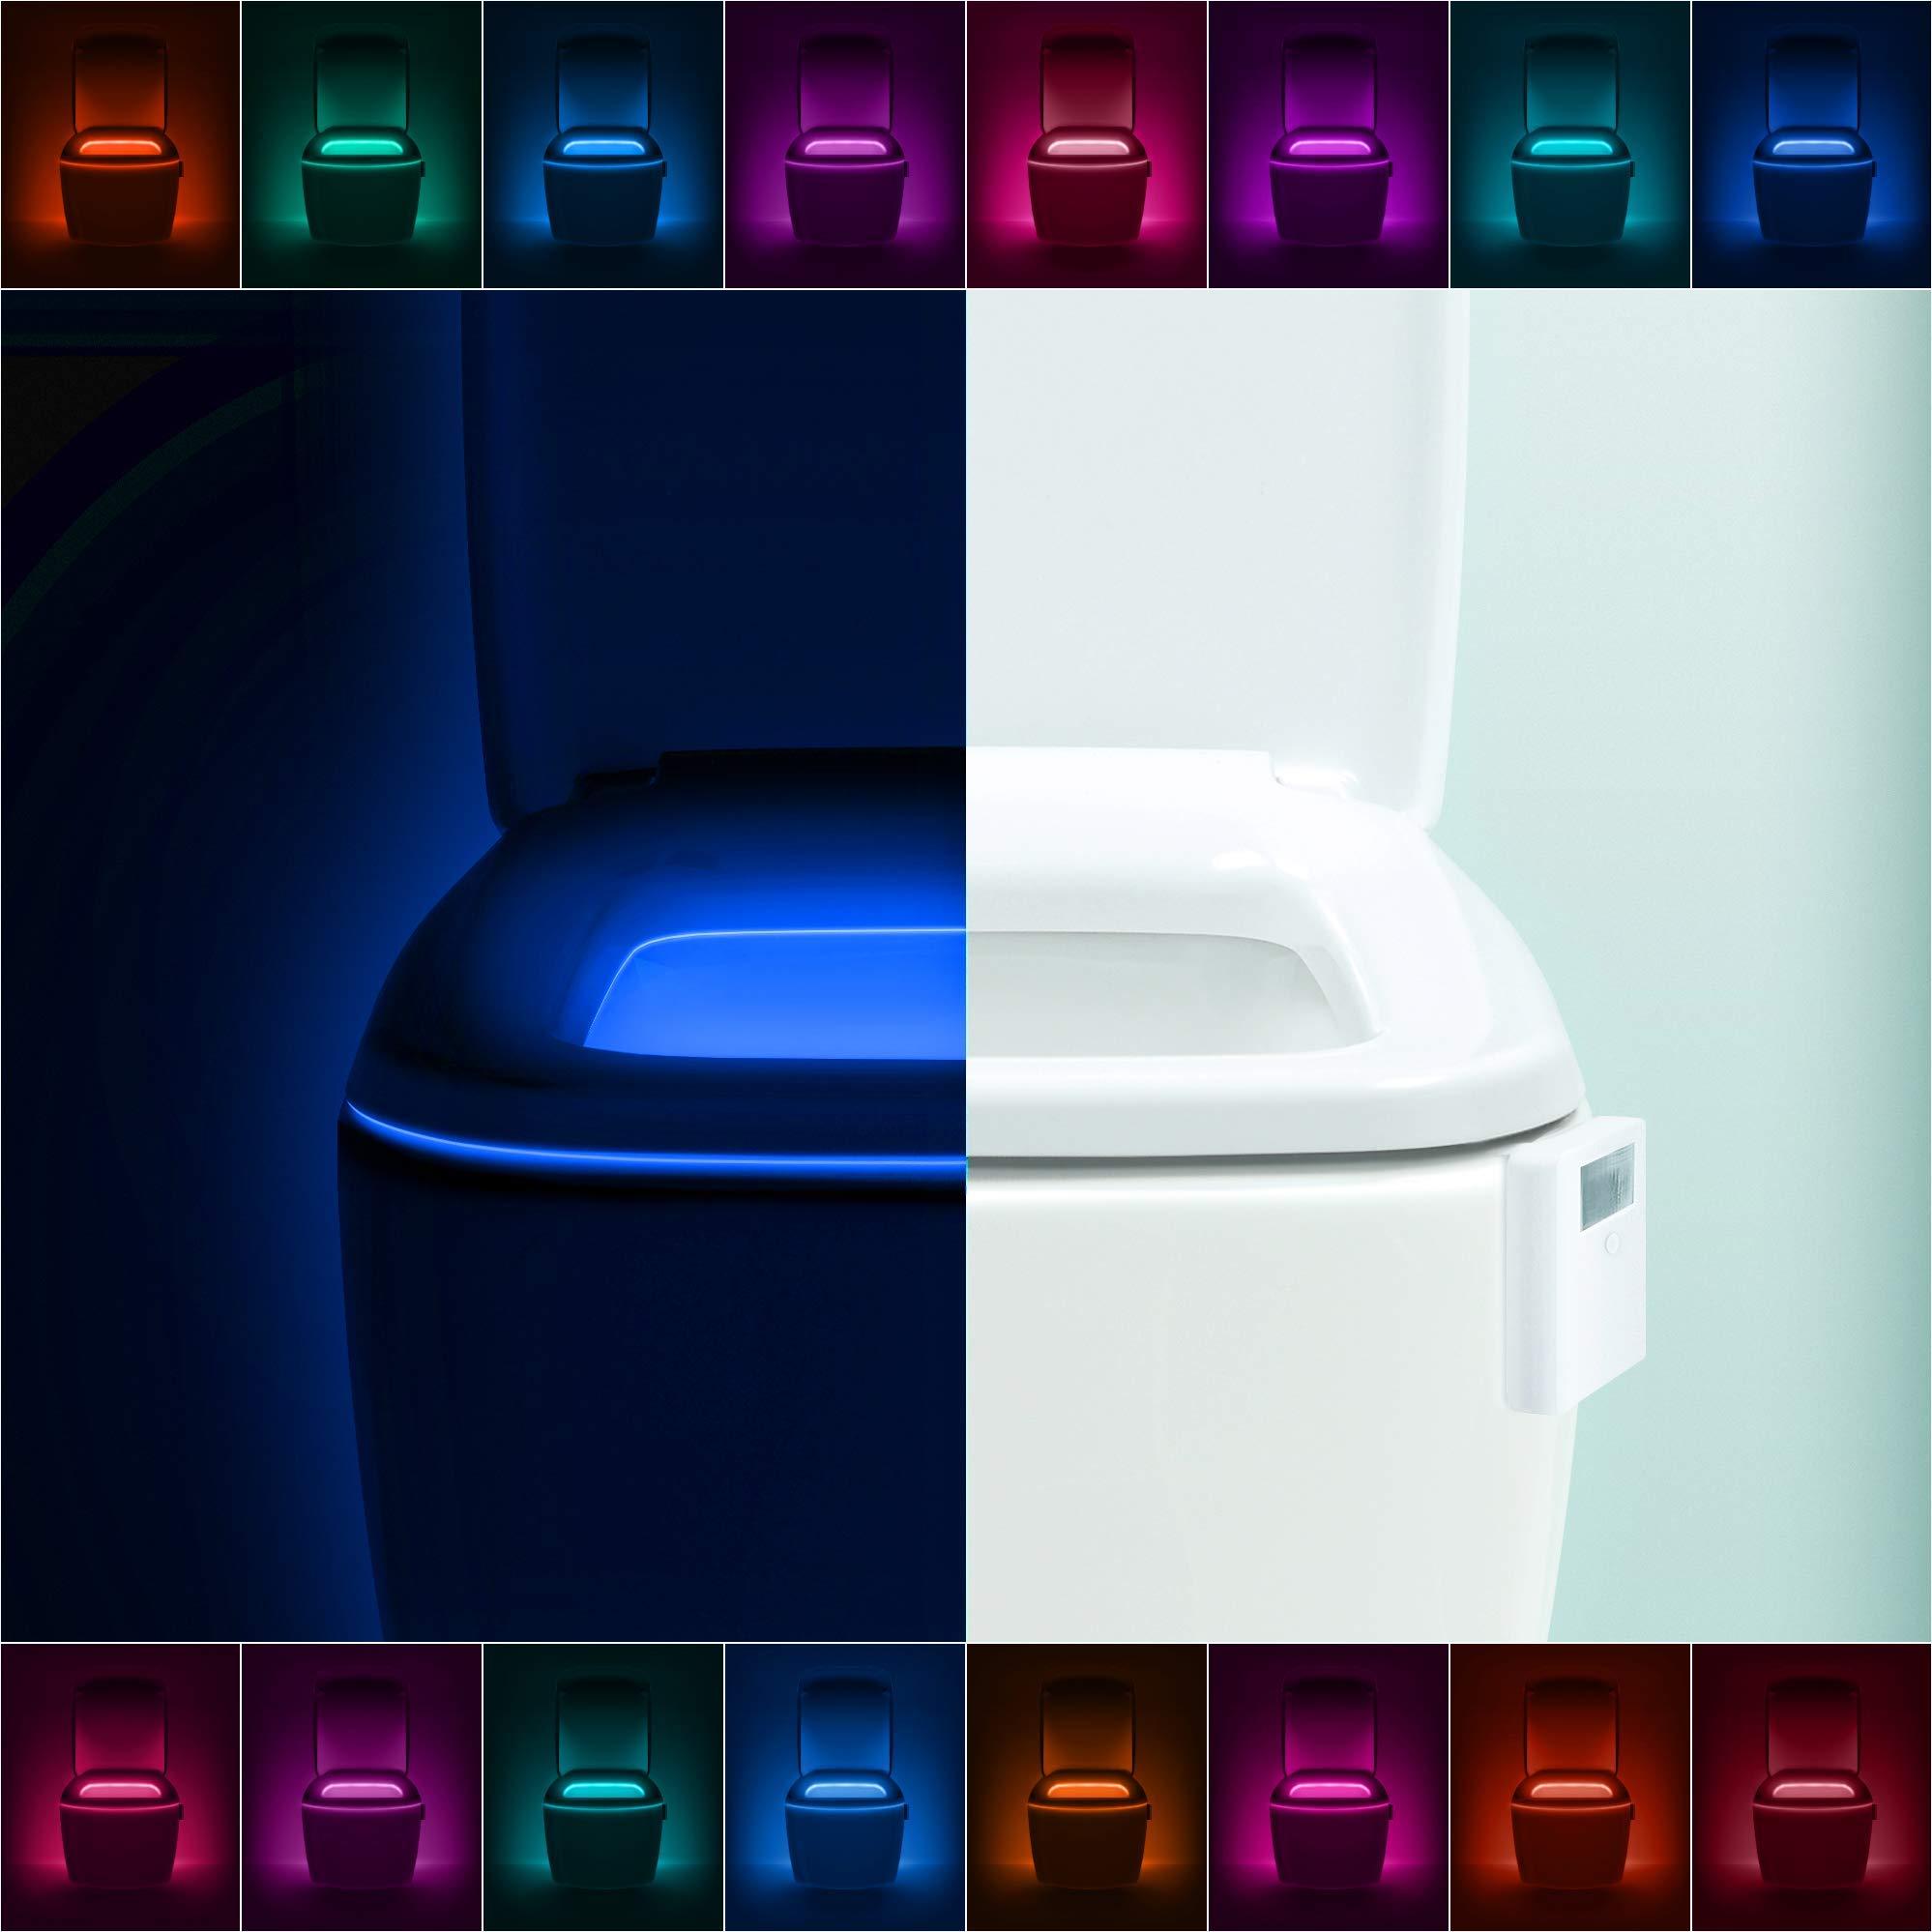 LumiLux Advanced 16-Color Motion Sensor LED Toilet Bowl Night, Internal Memory, Light Detection, Stocking Stuffer, White